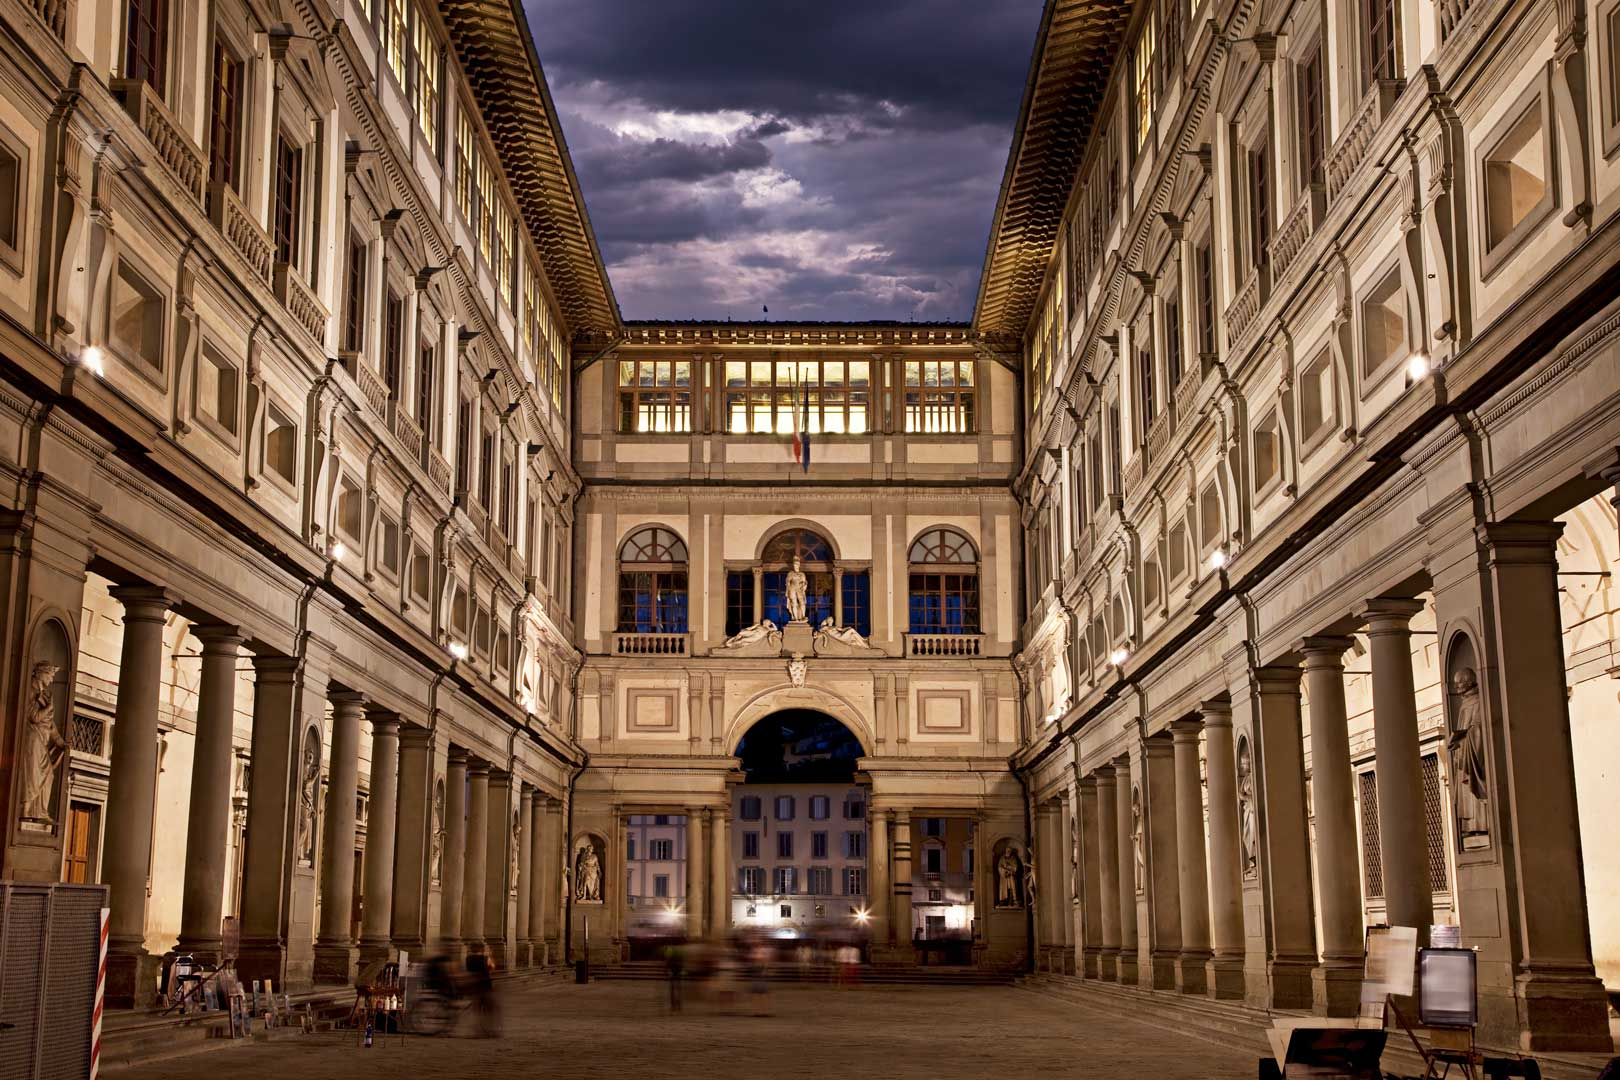 The Uffizi Galleries